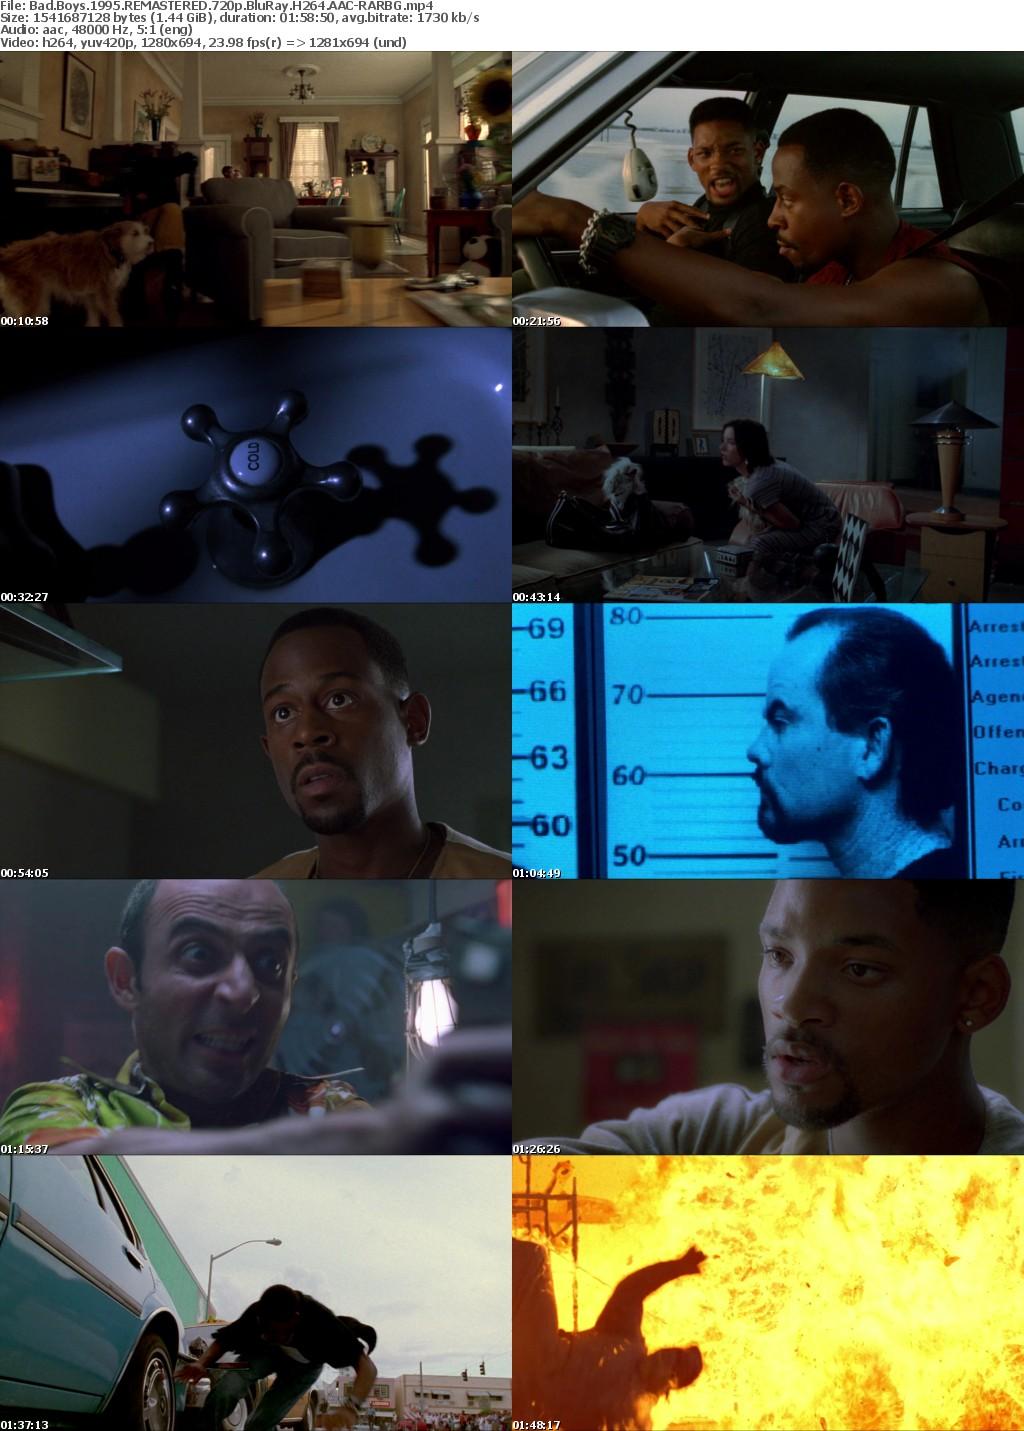 Bad Boys (1995) REMASTERED 720p BluRay H264 AAC-RARBG